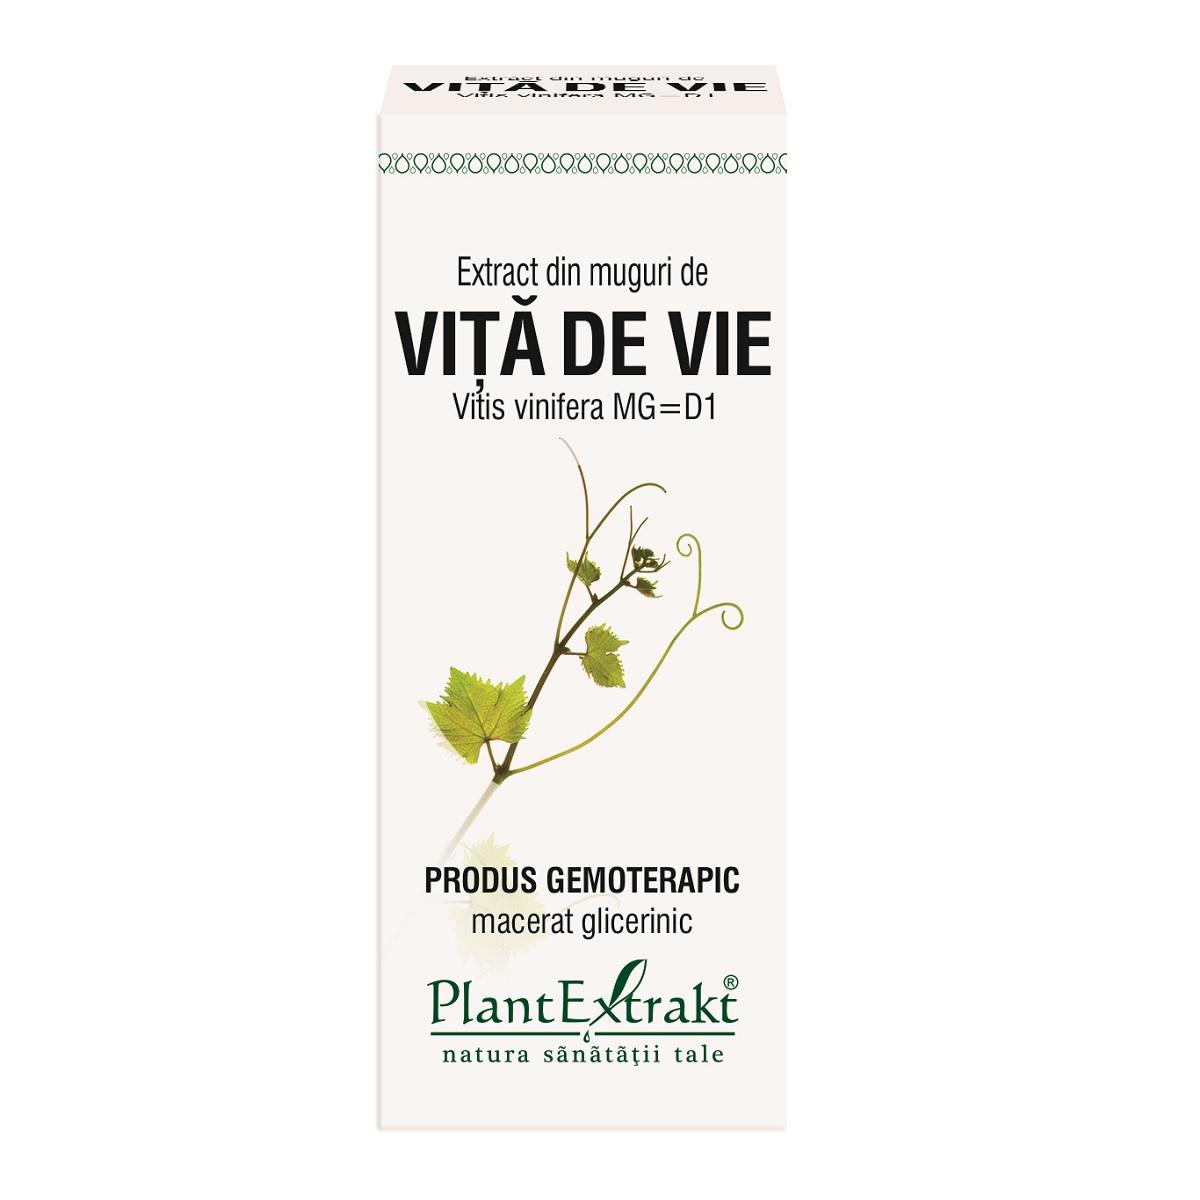 Extract din muguri de Vita de Vie, 50ml, Plantextrakt imagine produs 2021